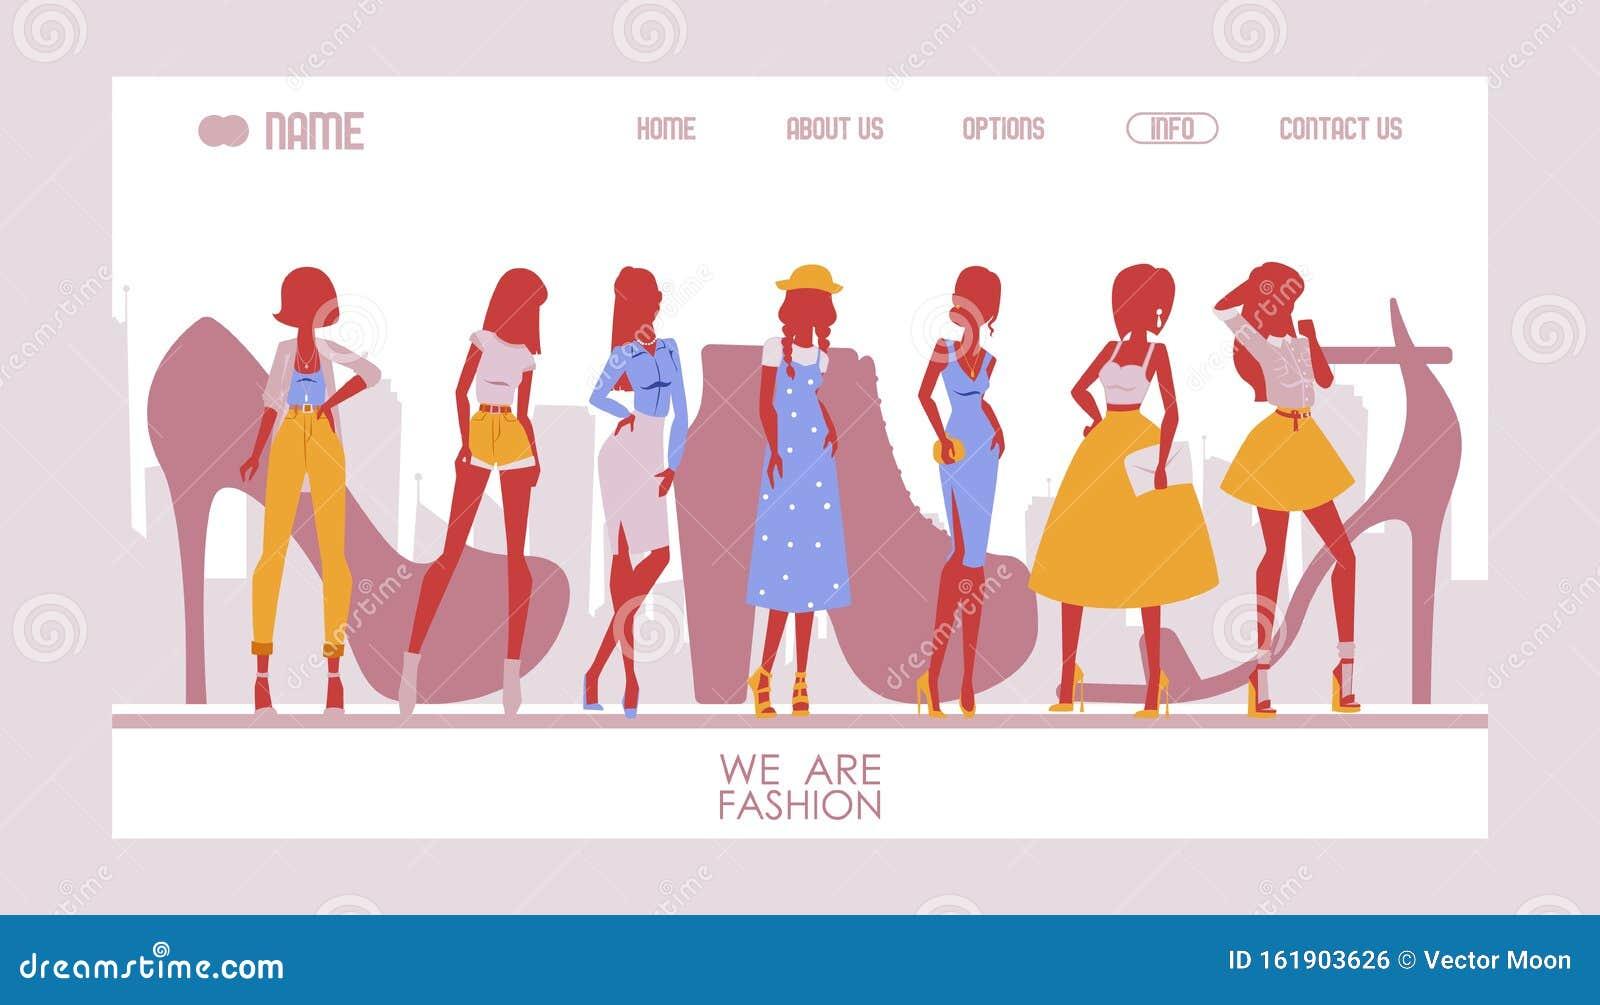 Fashion Designer Website Template Vector Illustration Landing Page Design For Clothes And Accessories Store Fashion Stock Vector Illustration Of Elegant Collection 161903626